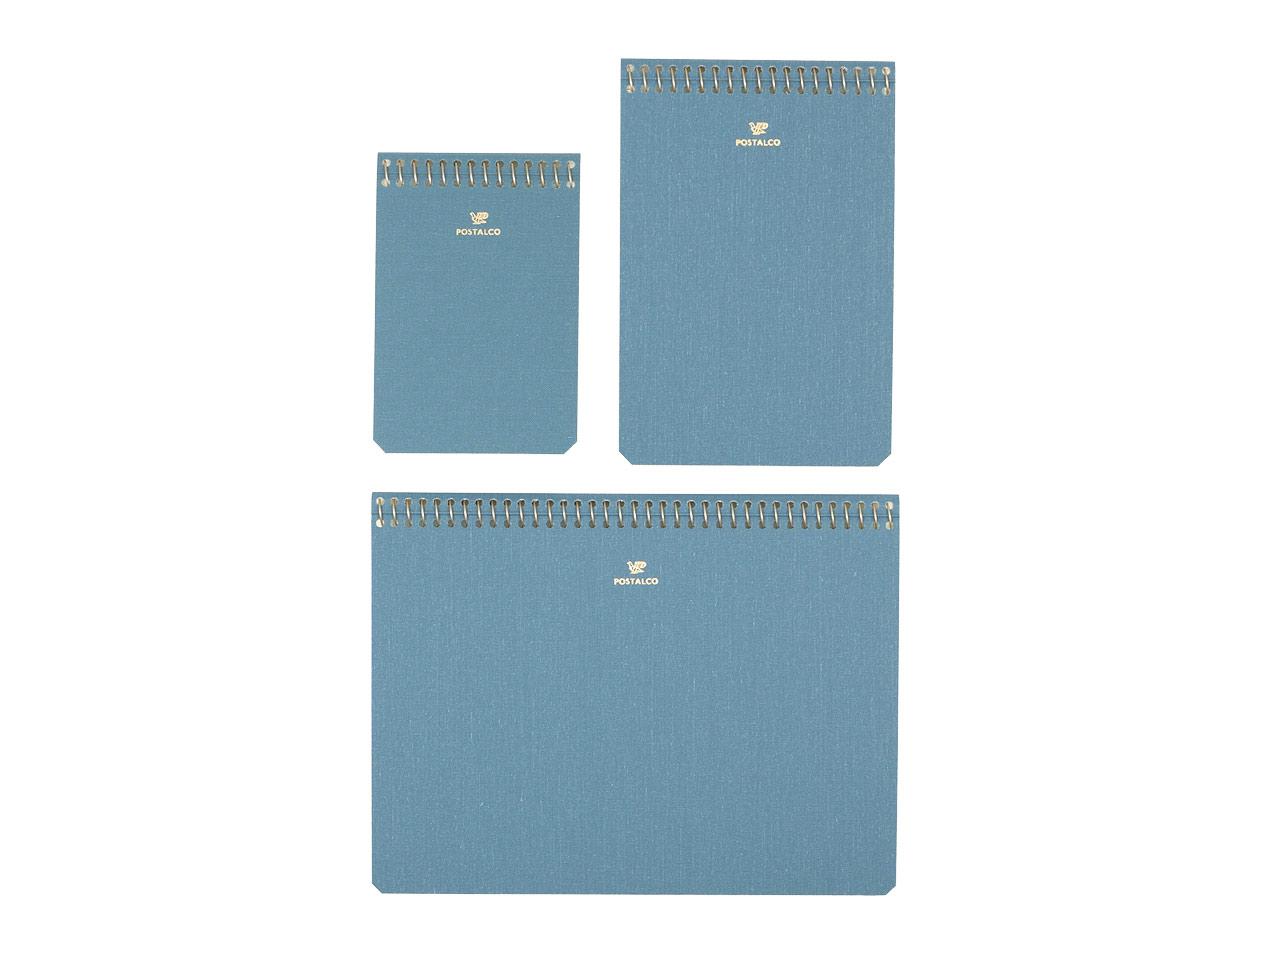 POSTALCO Notebook A7 / A6 / A5